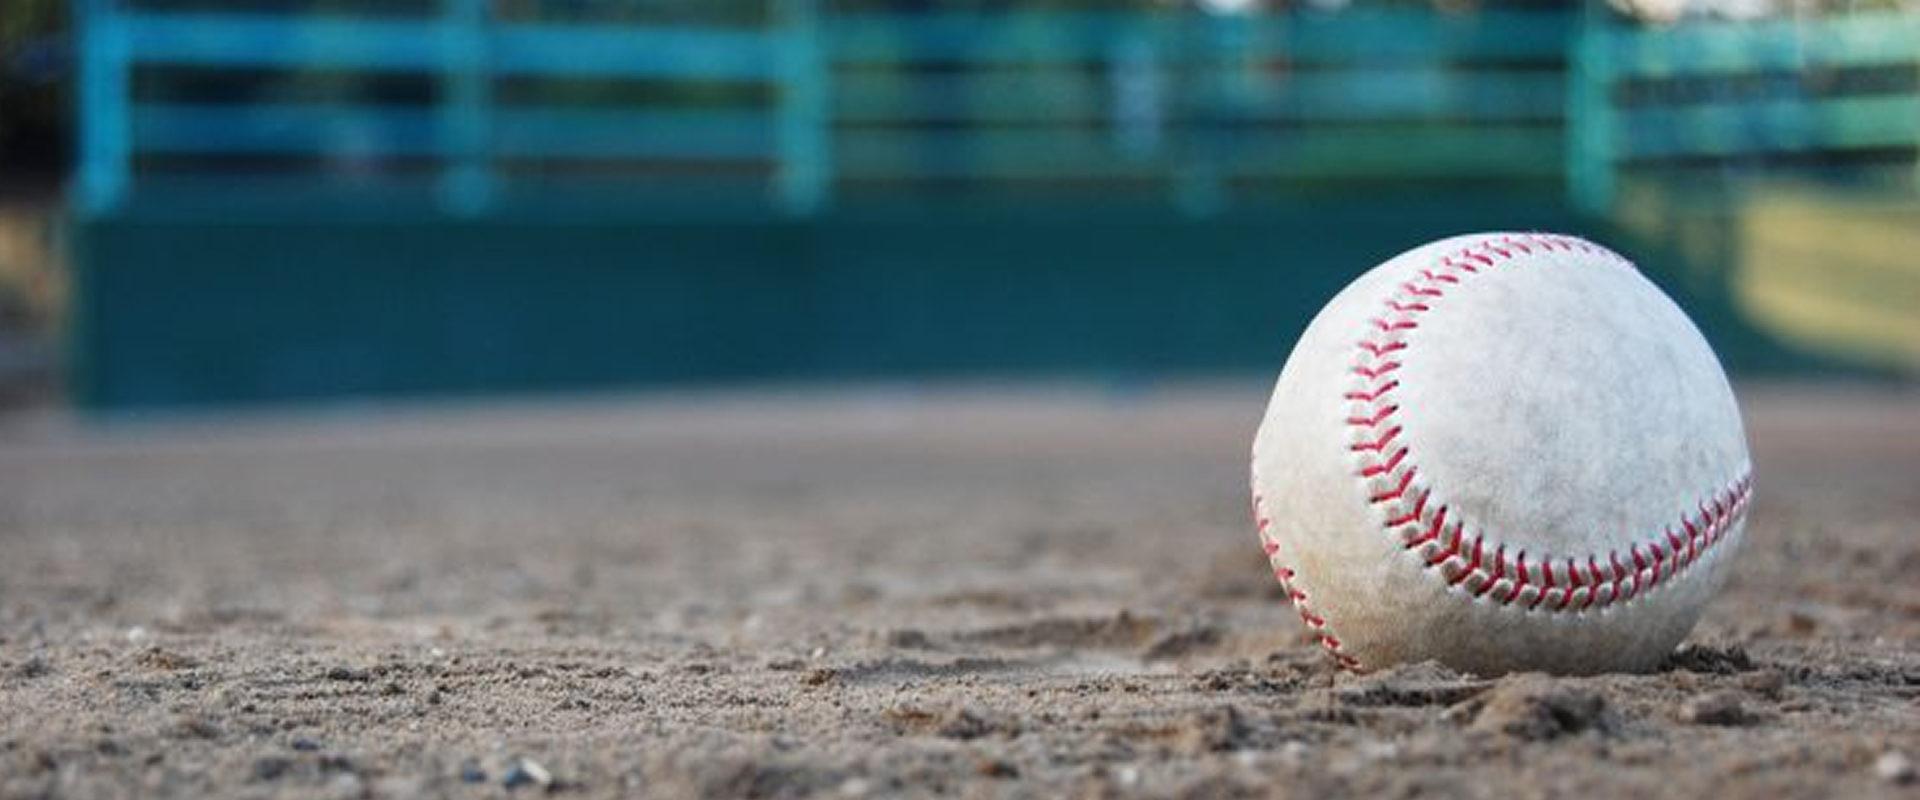 The All Gungin Baseball Team OB